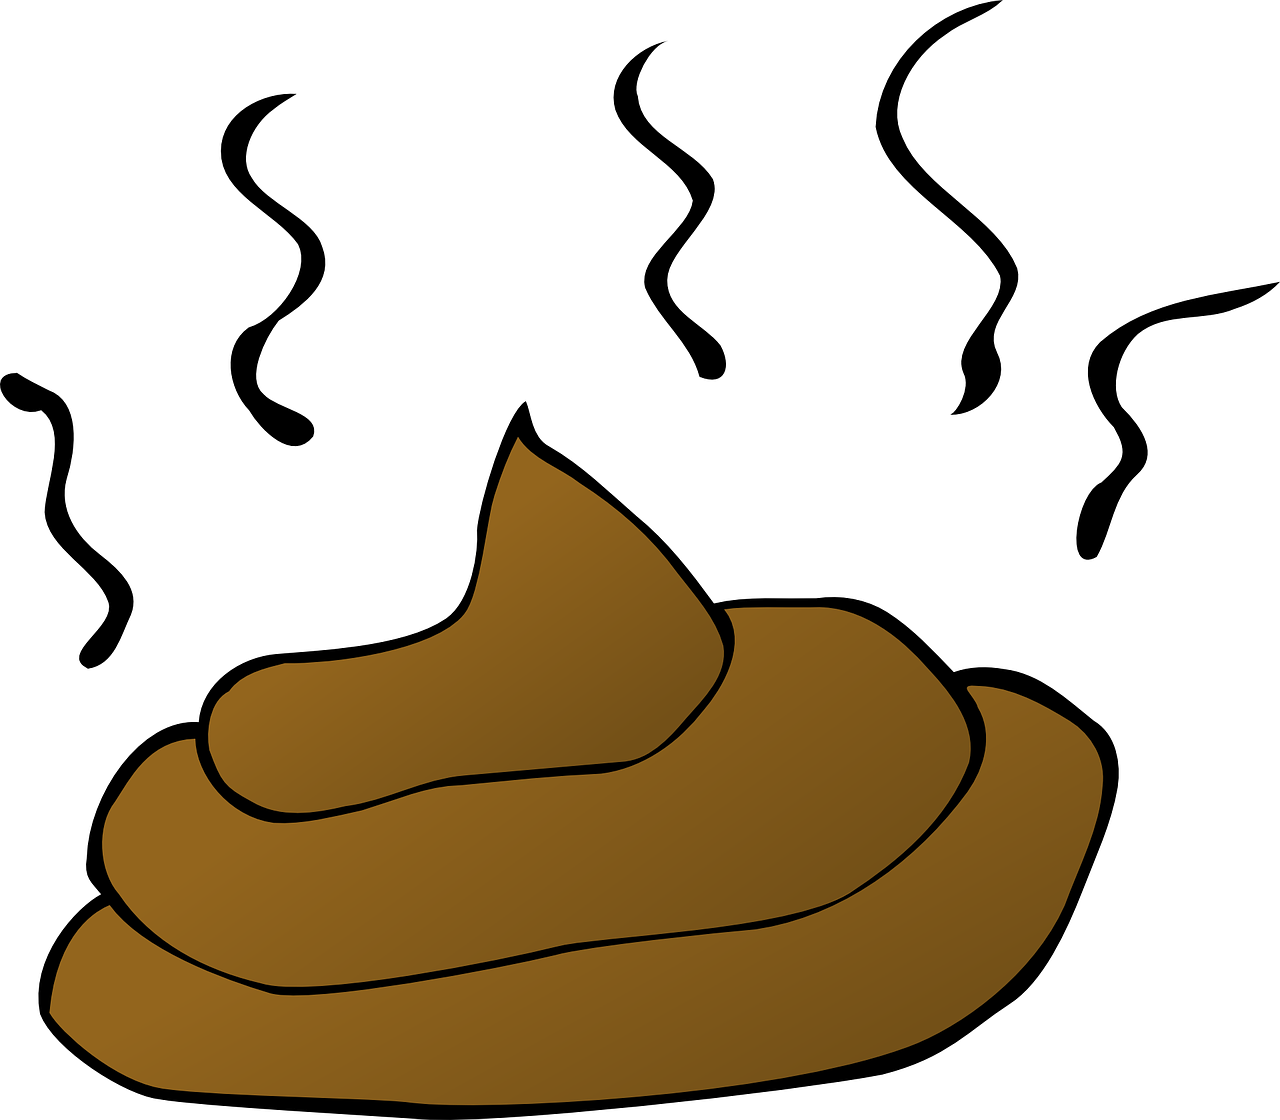 No Poop Clipart.